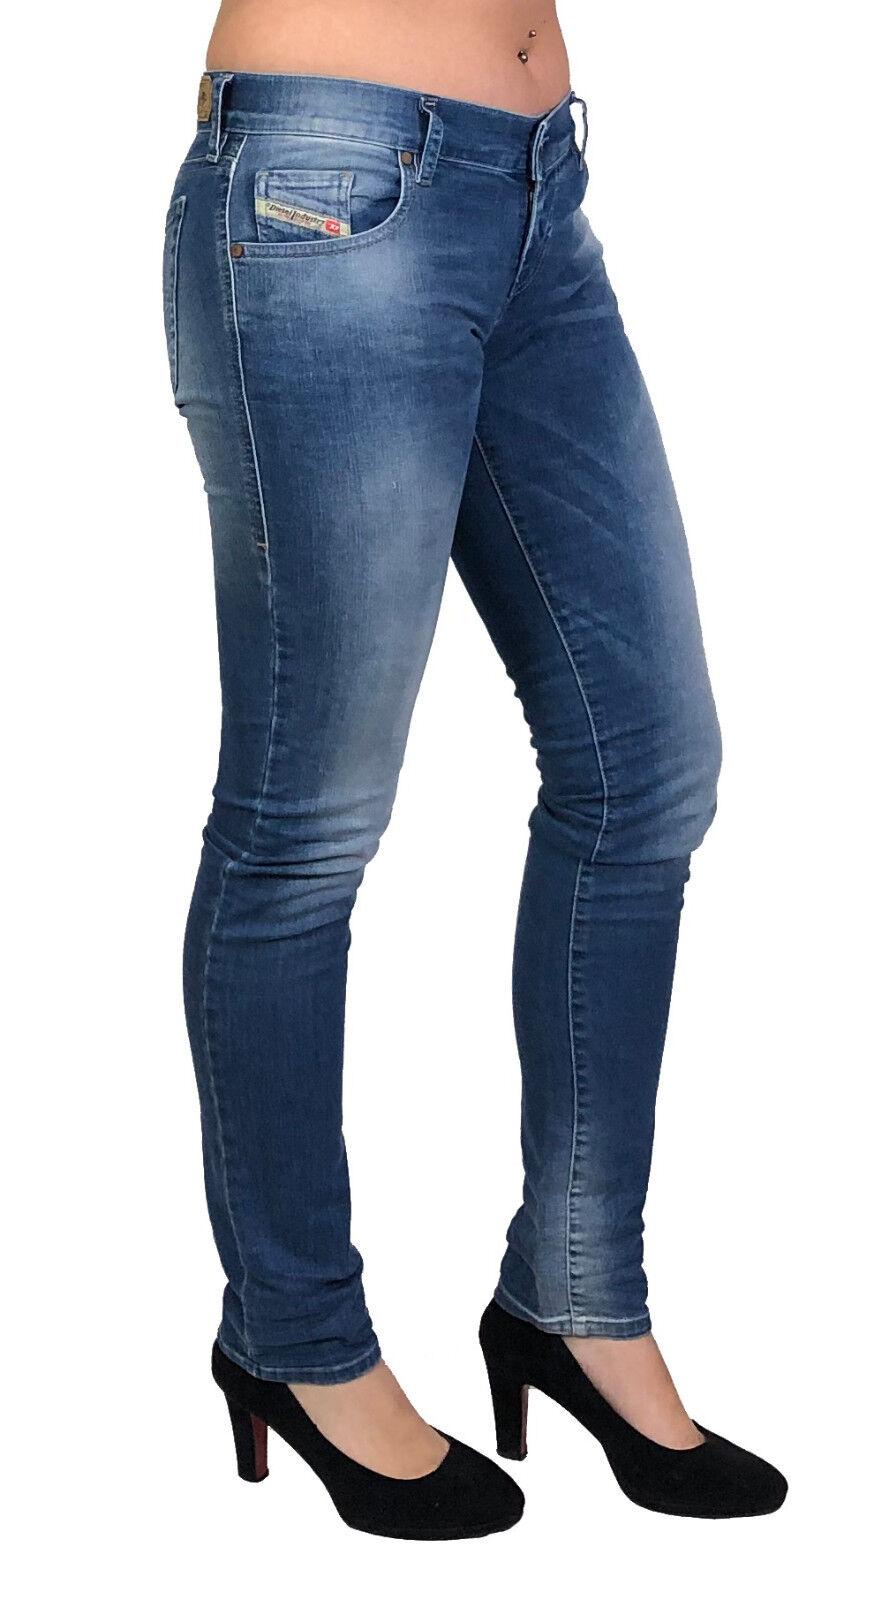 Diesel Damen Stretch Jeans GRUPEE 0670K Superslim Skinny blau Gr. 24 32 NEU